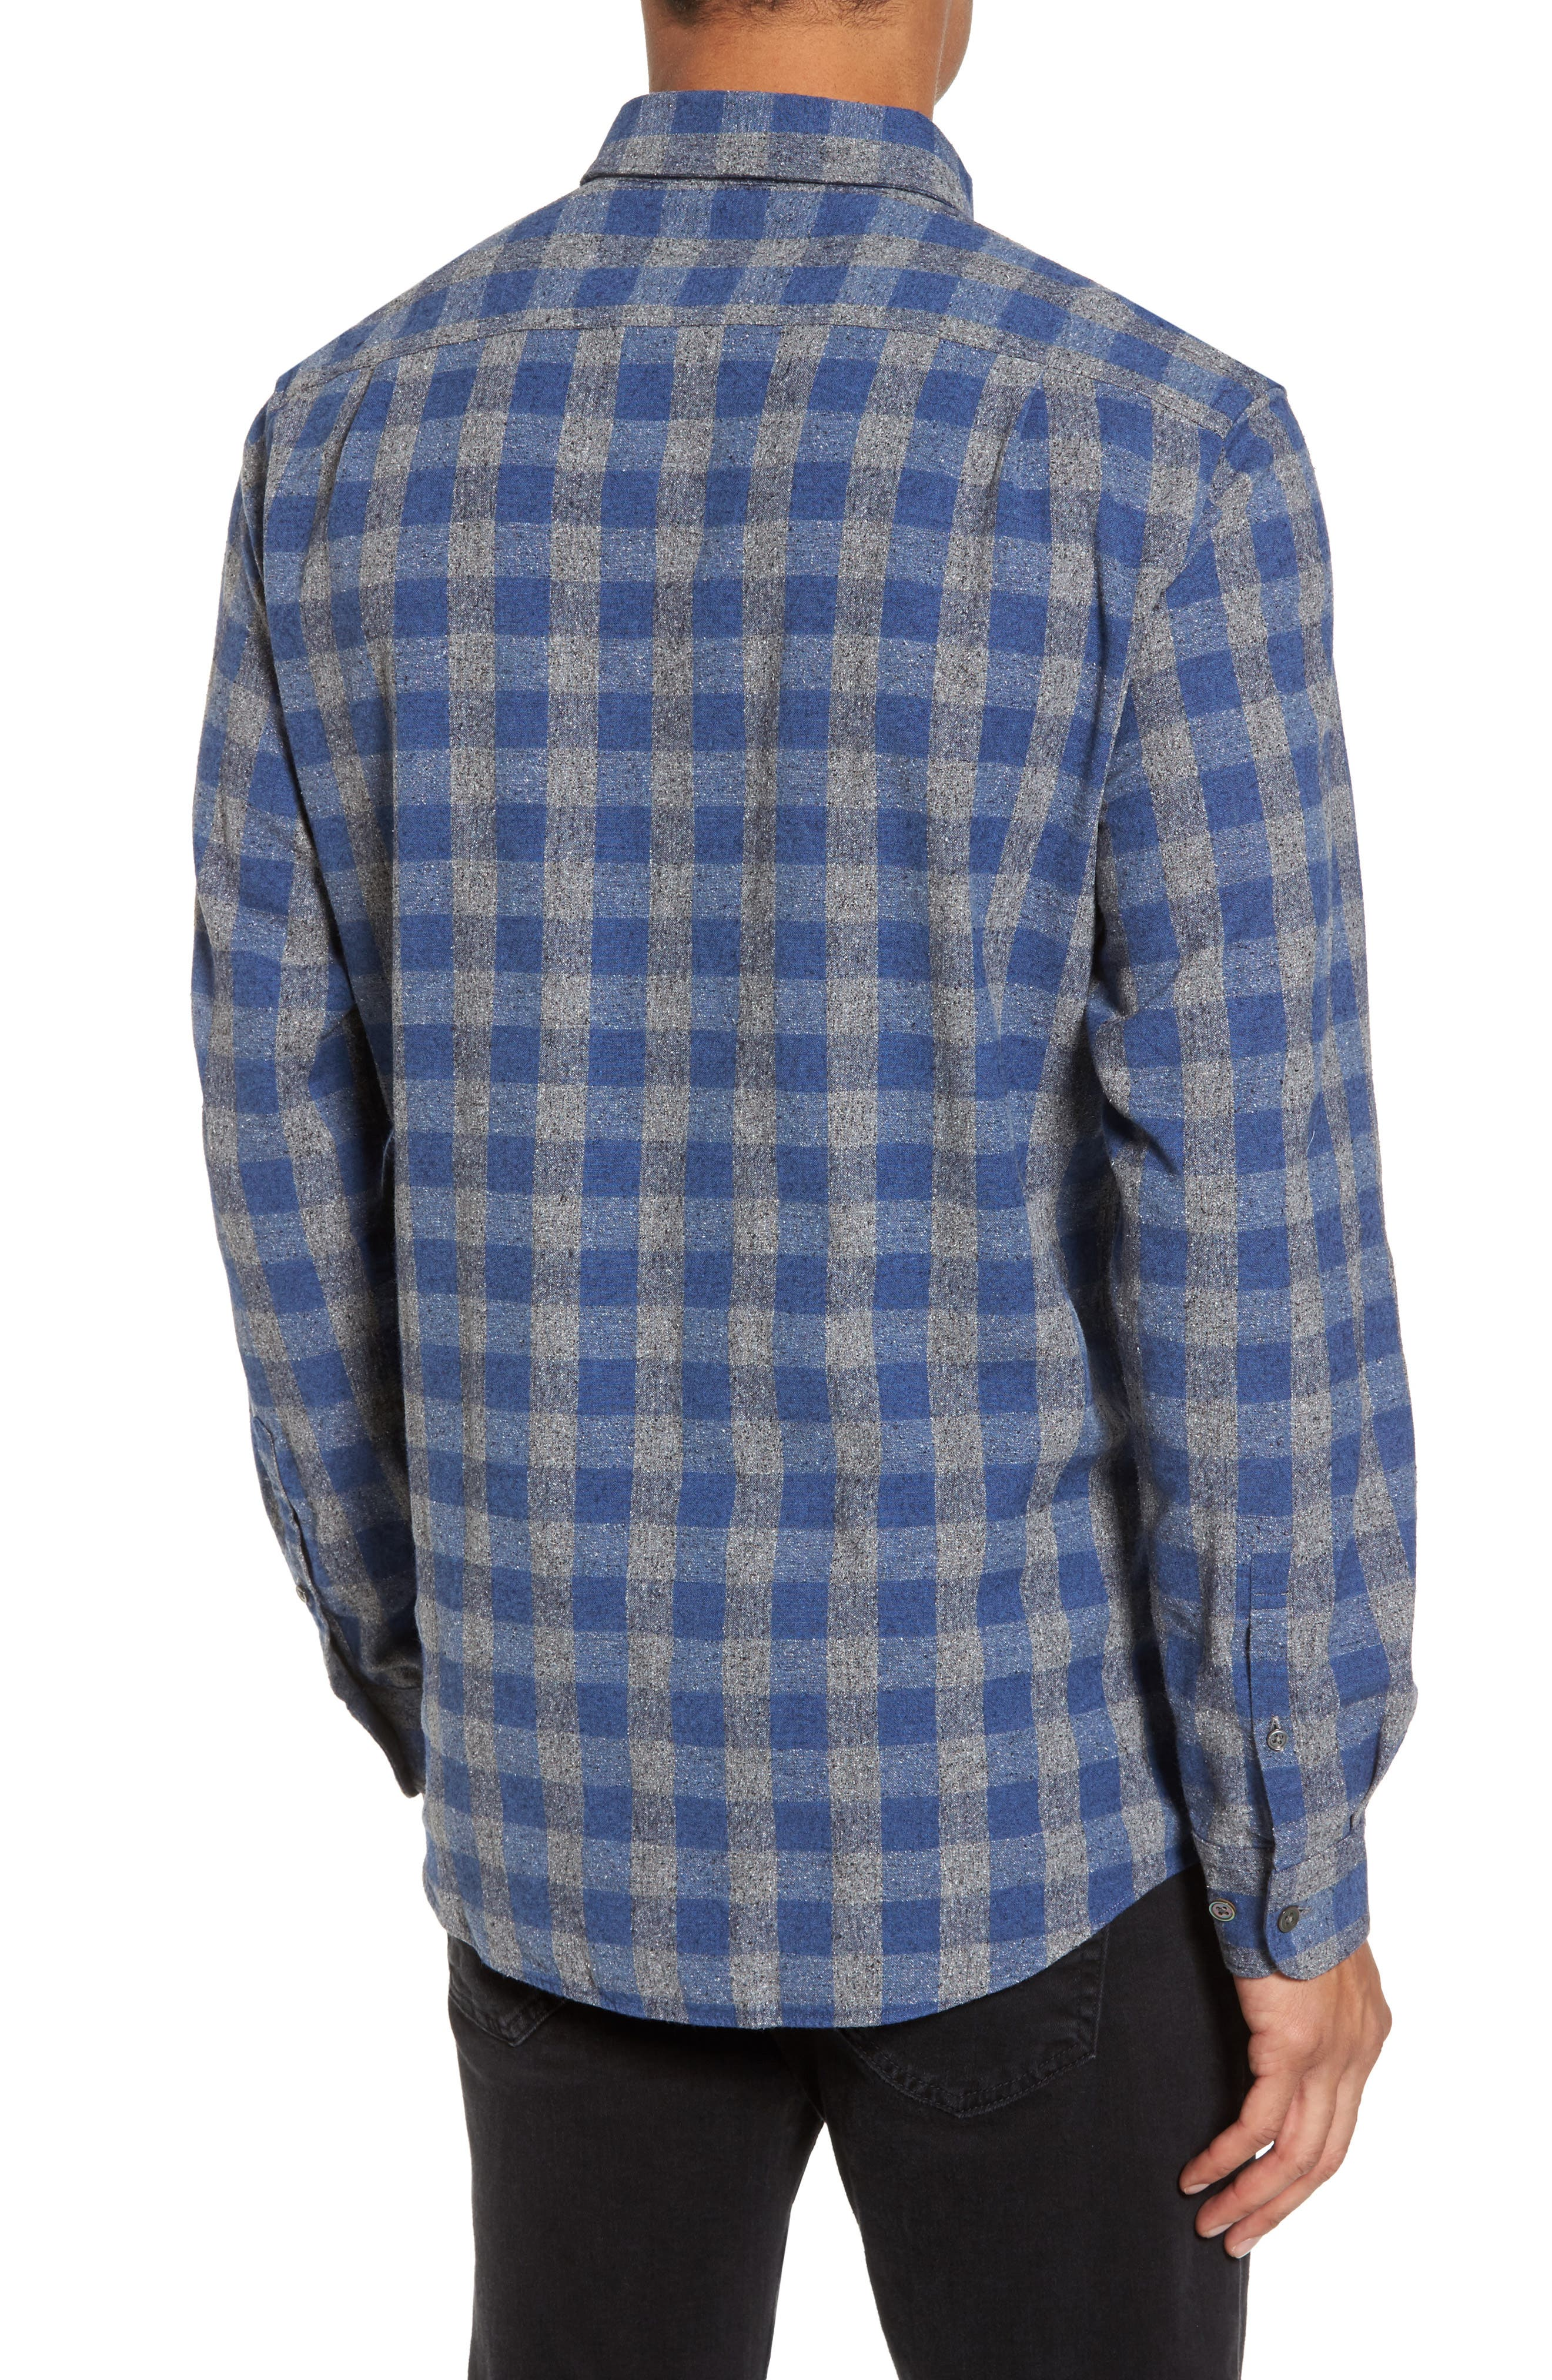 Alternate Image 2  - Rodd & Gunn Avon River Sports Fit Check Flannel Shirt